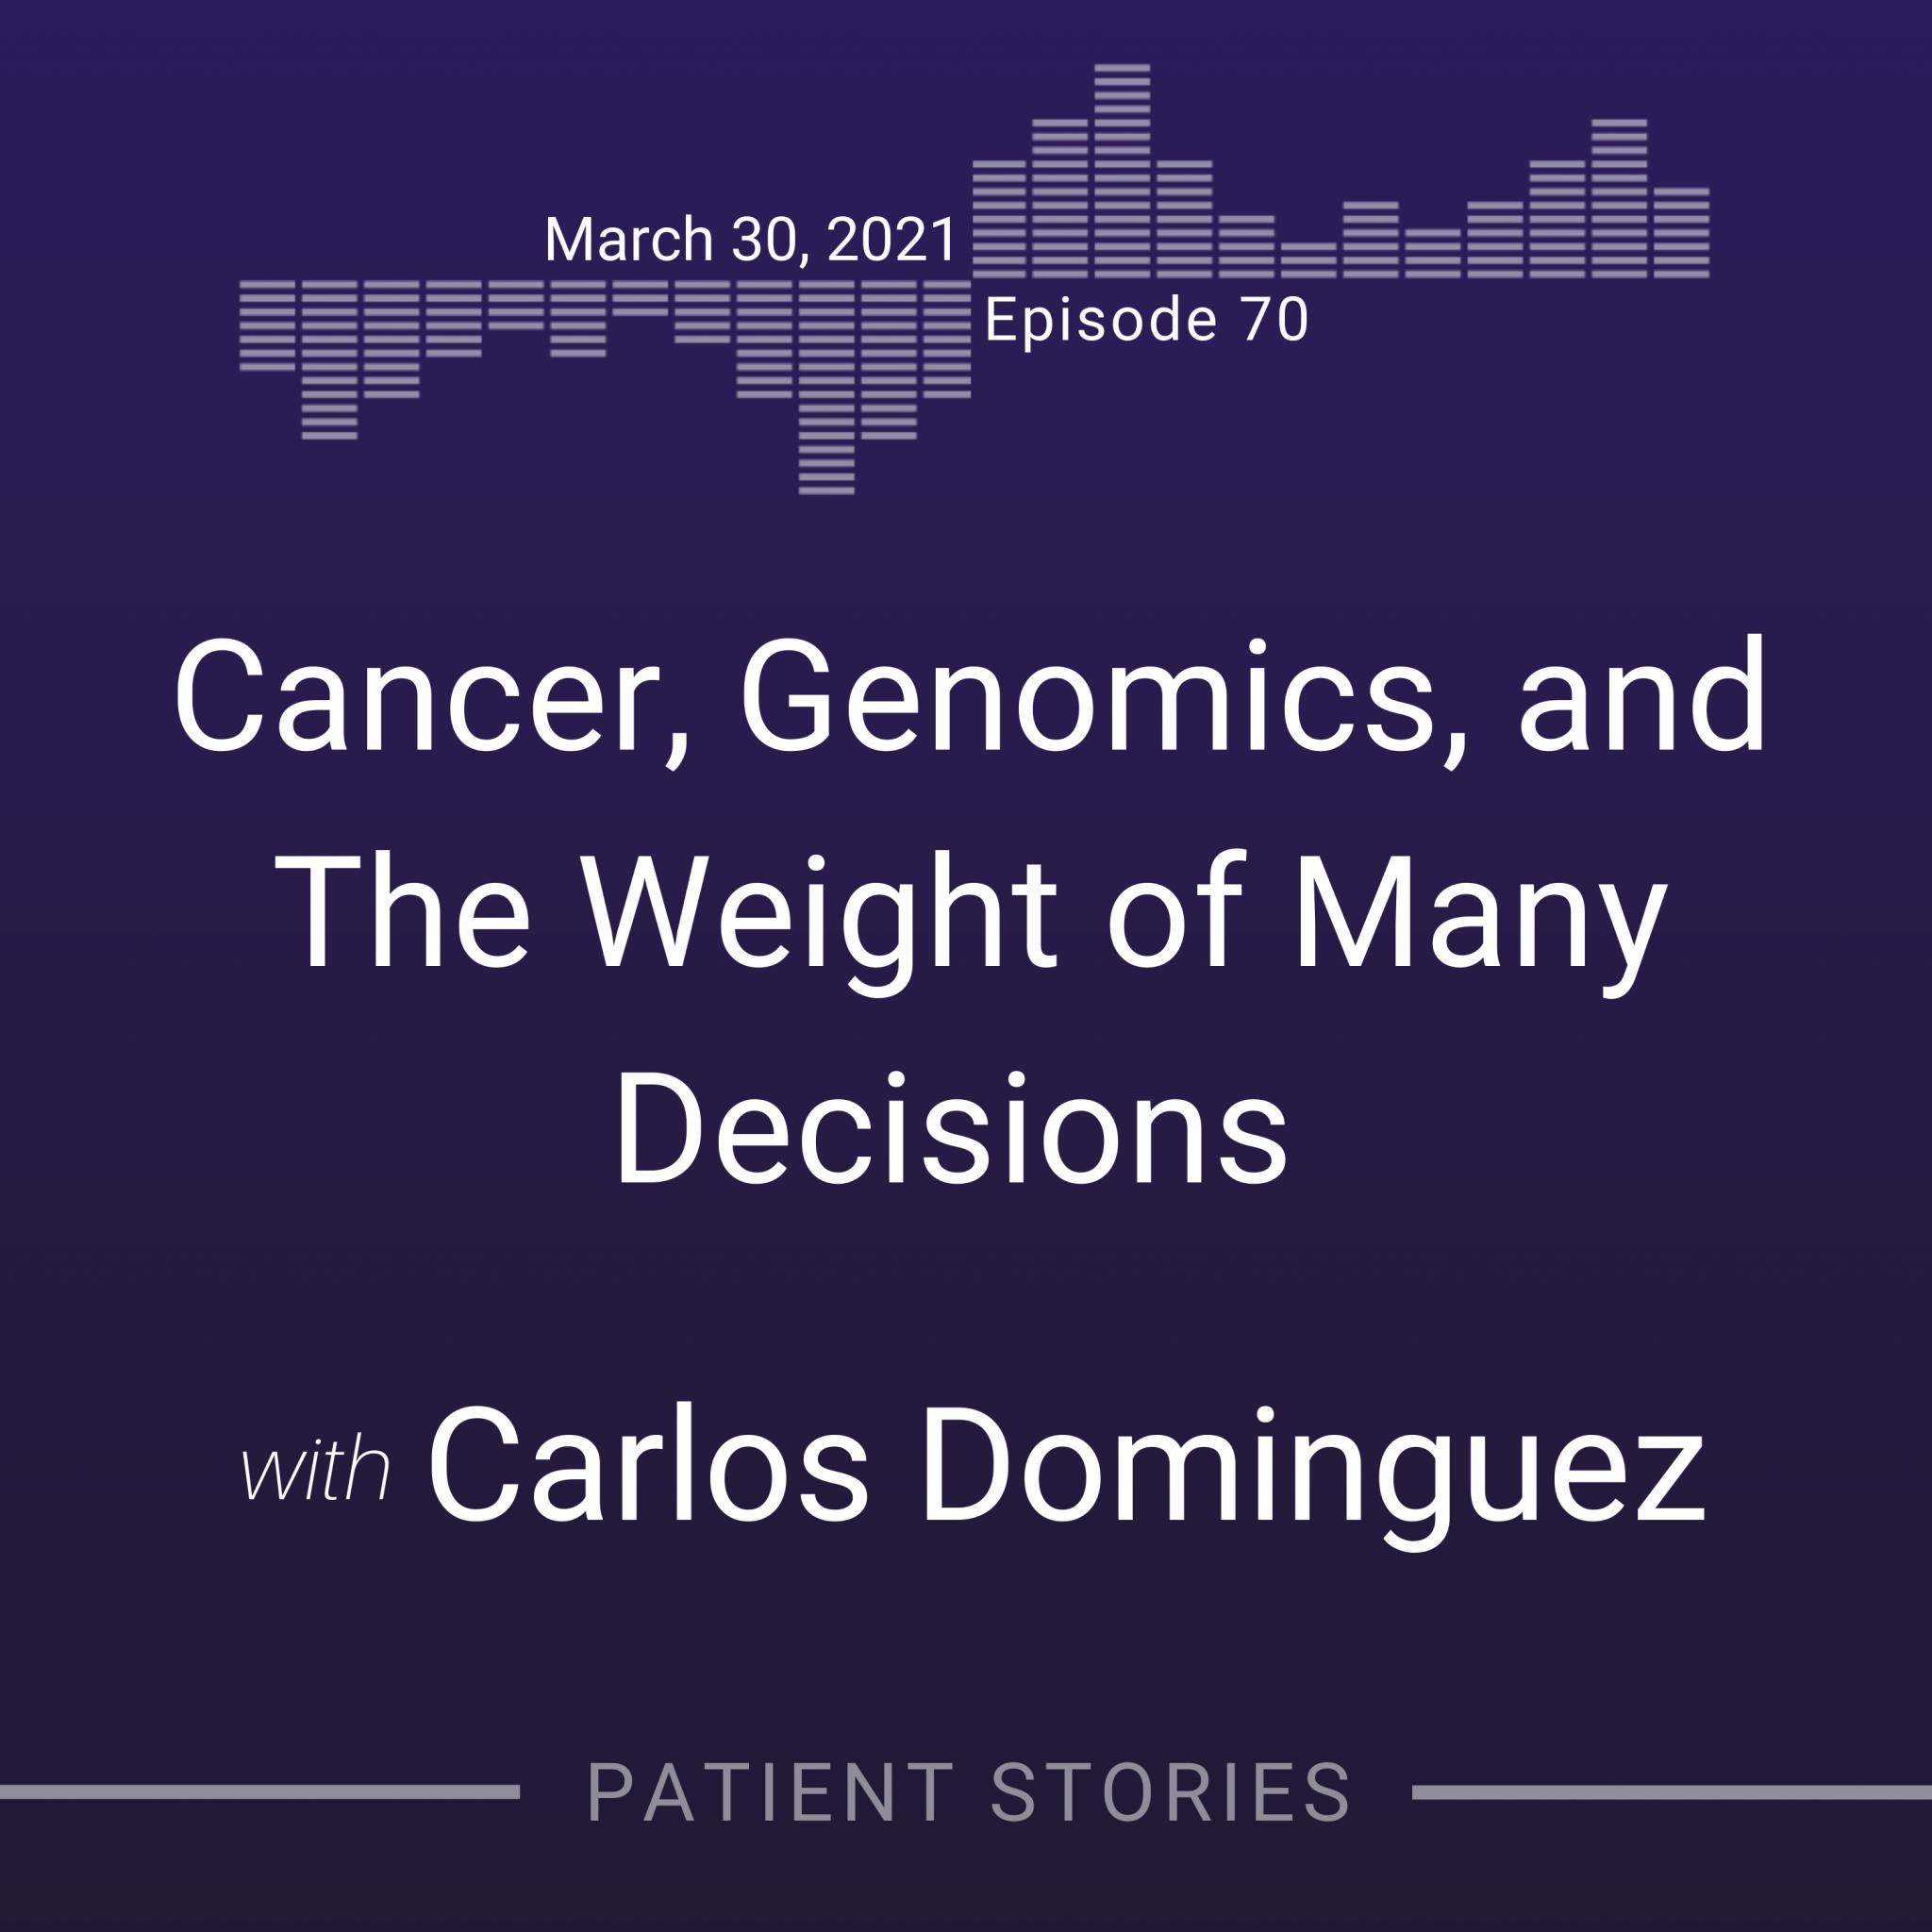 cancer, genomics